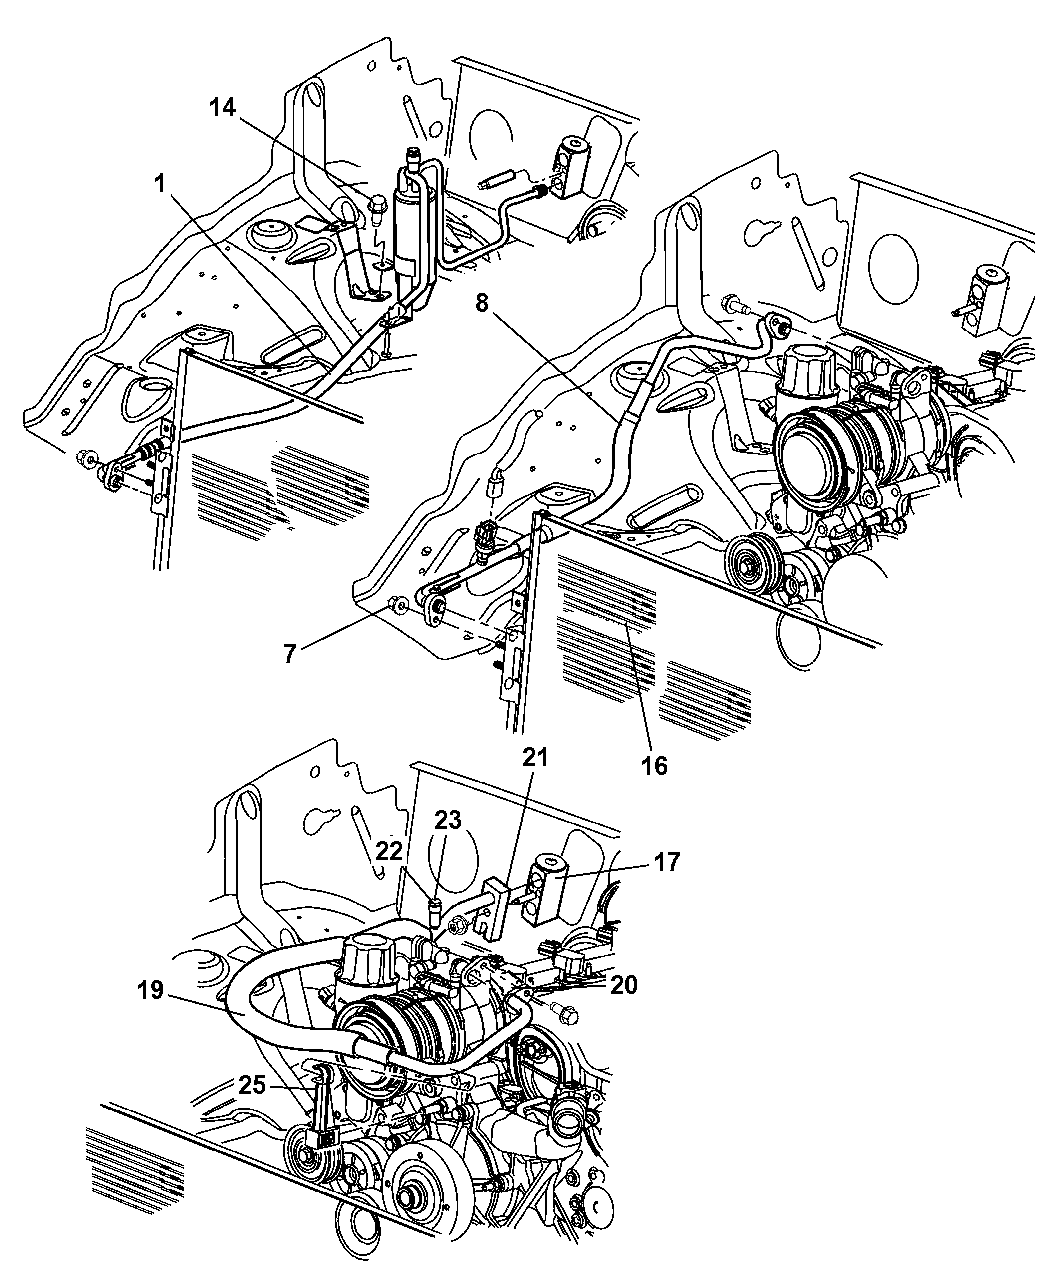 2002 Jeep Grand Cherokee 4 7 Engine Parts Diagram. Jeep